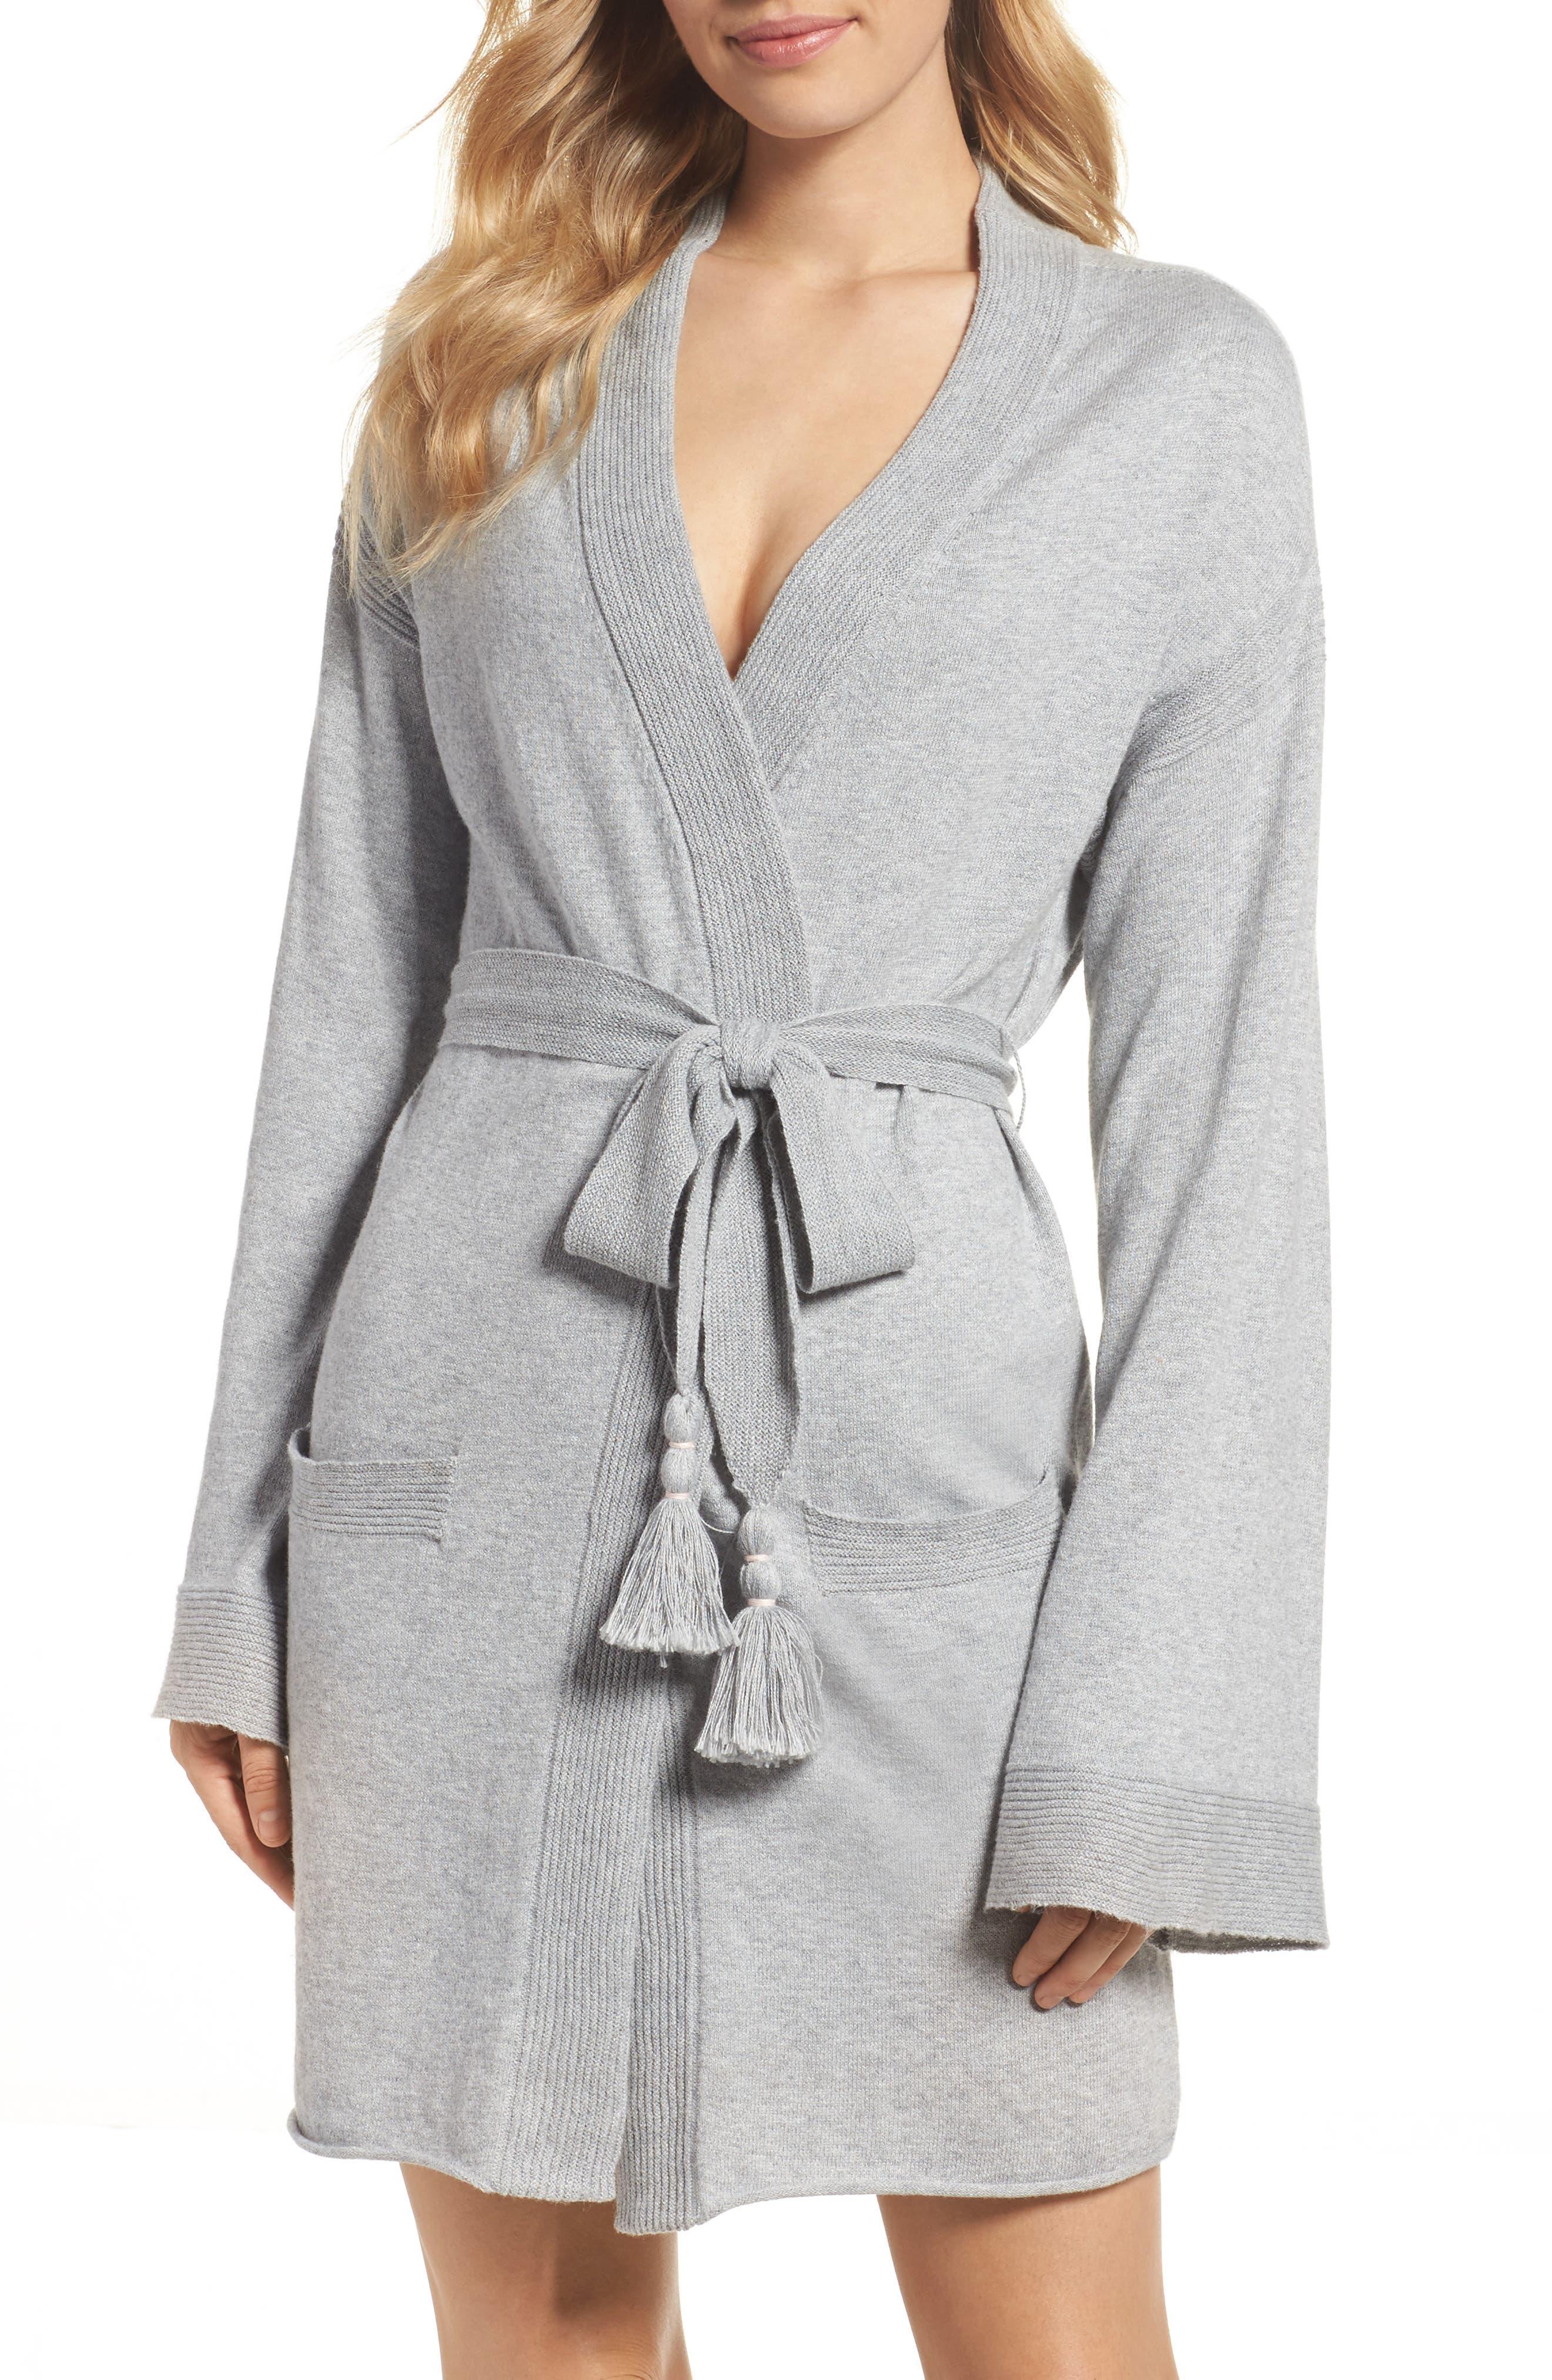 Valoria Short Robe,                         Main,                         color, 020